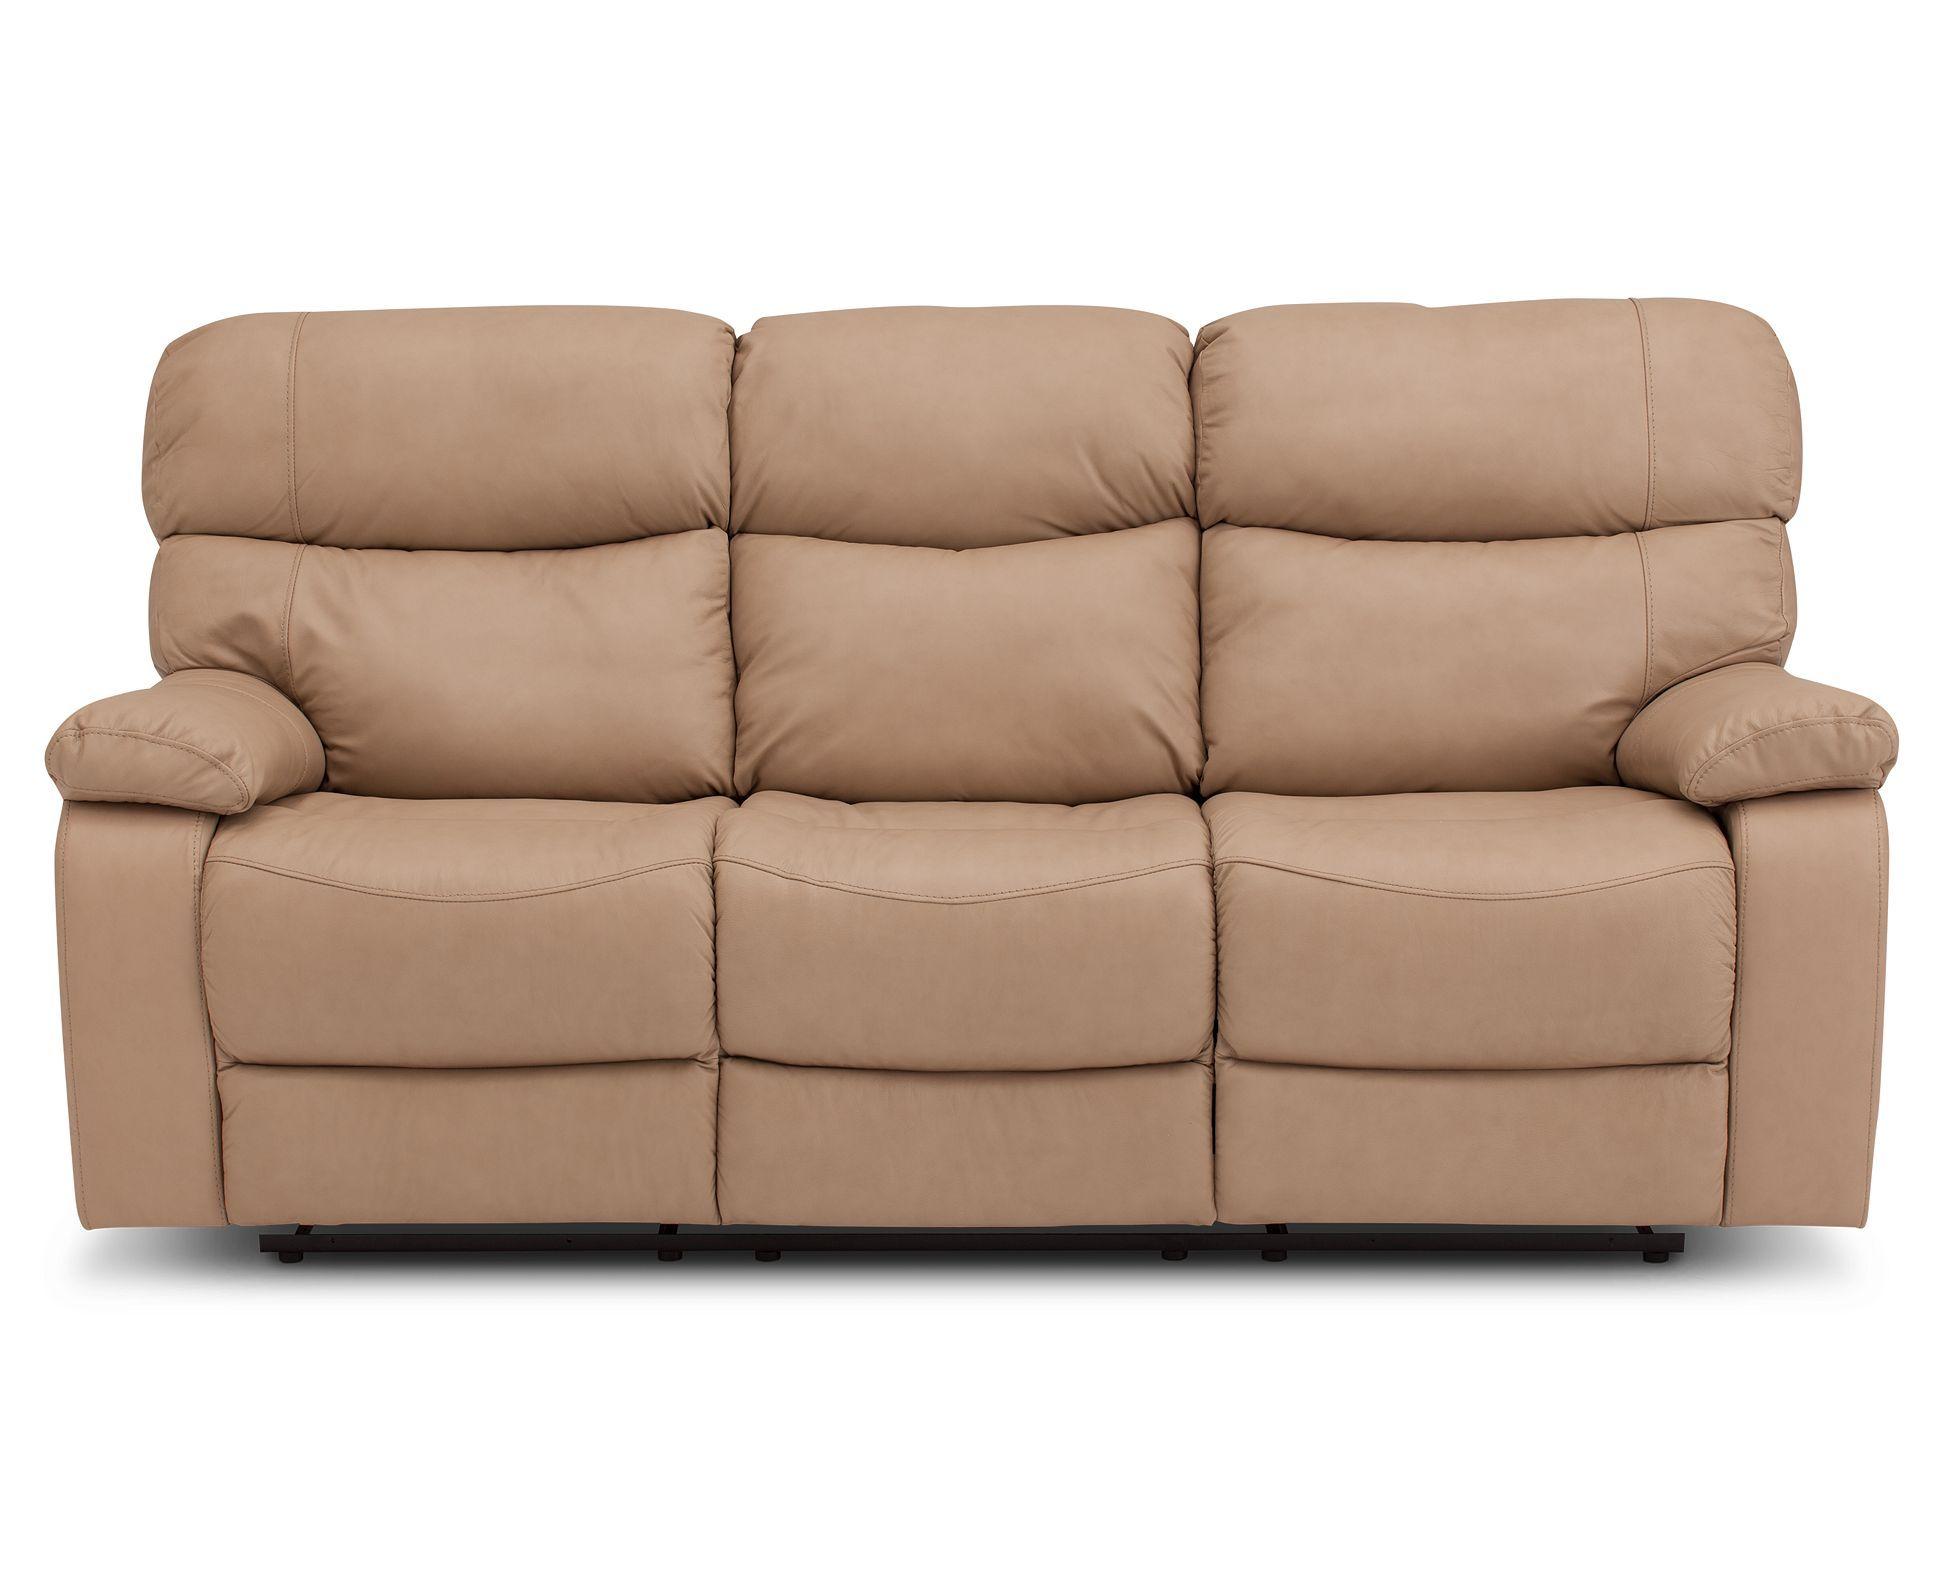 Truman Reclining Sofa Reclining Sofa Family Room Sofa Sofa Set